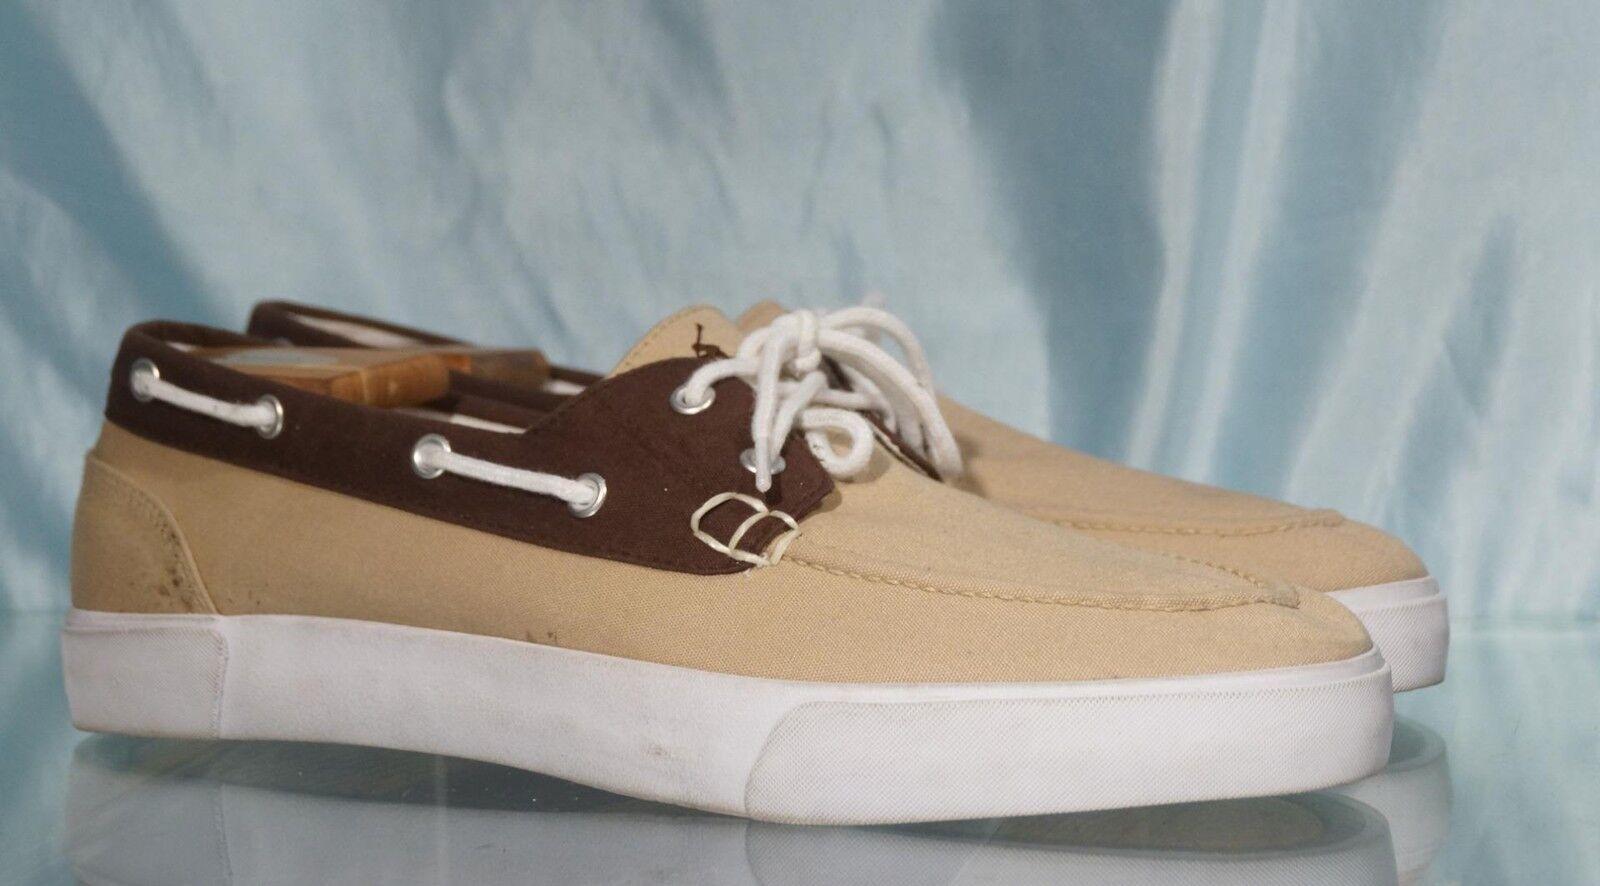 Handsome Beige & Brown Canvas RALPH LAUREN POLO Boat shoes 13D